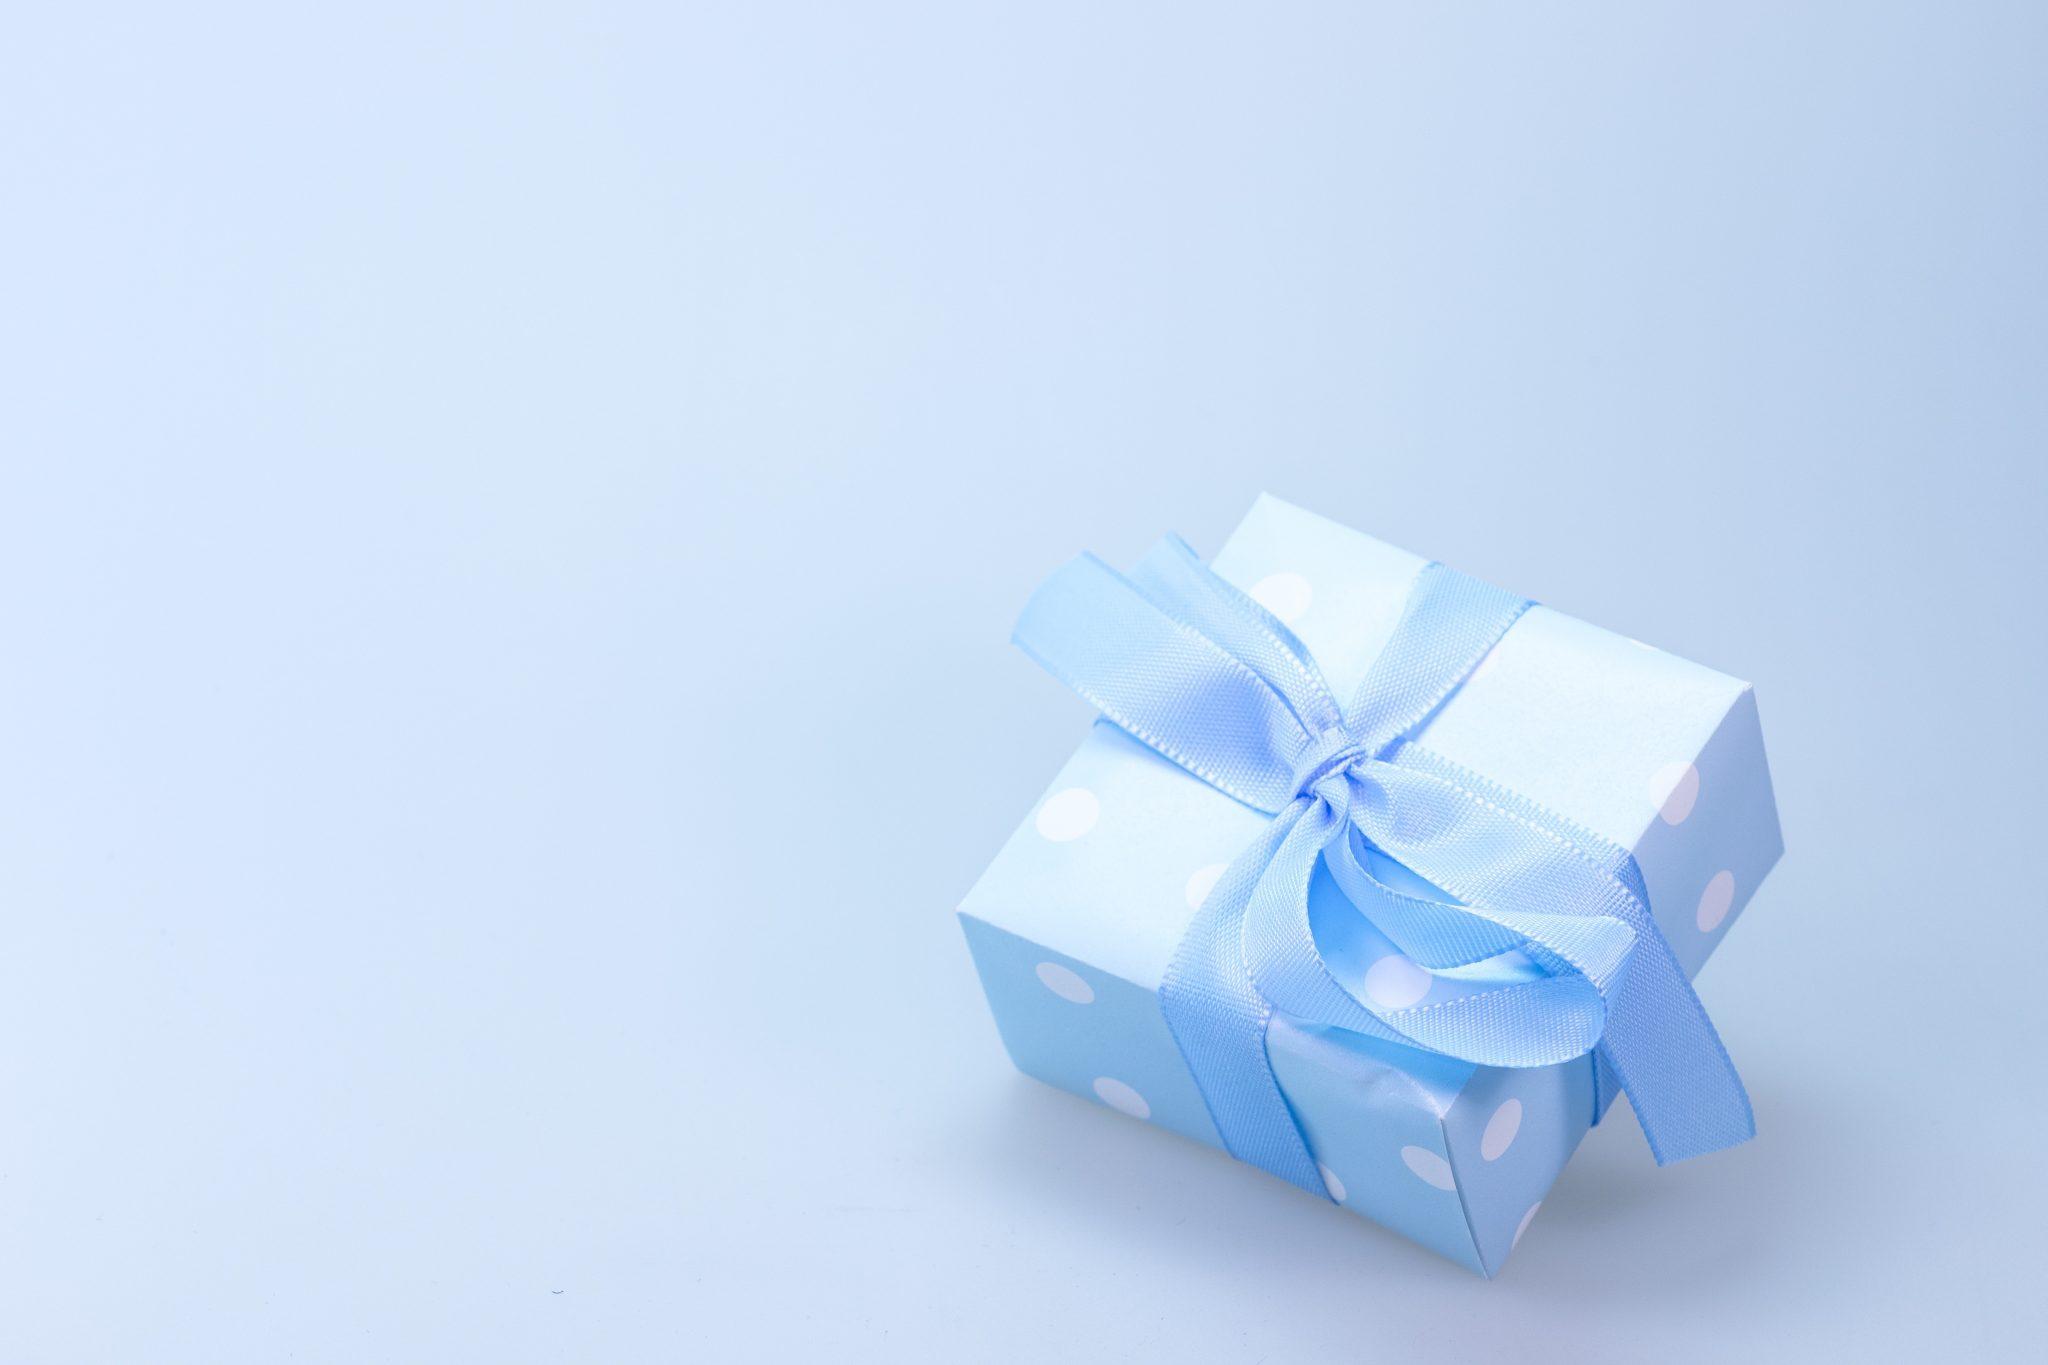 Corporate gift ideas